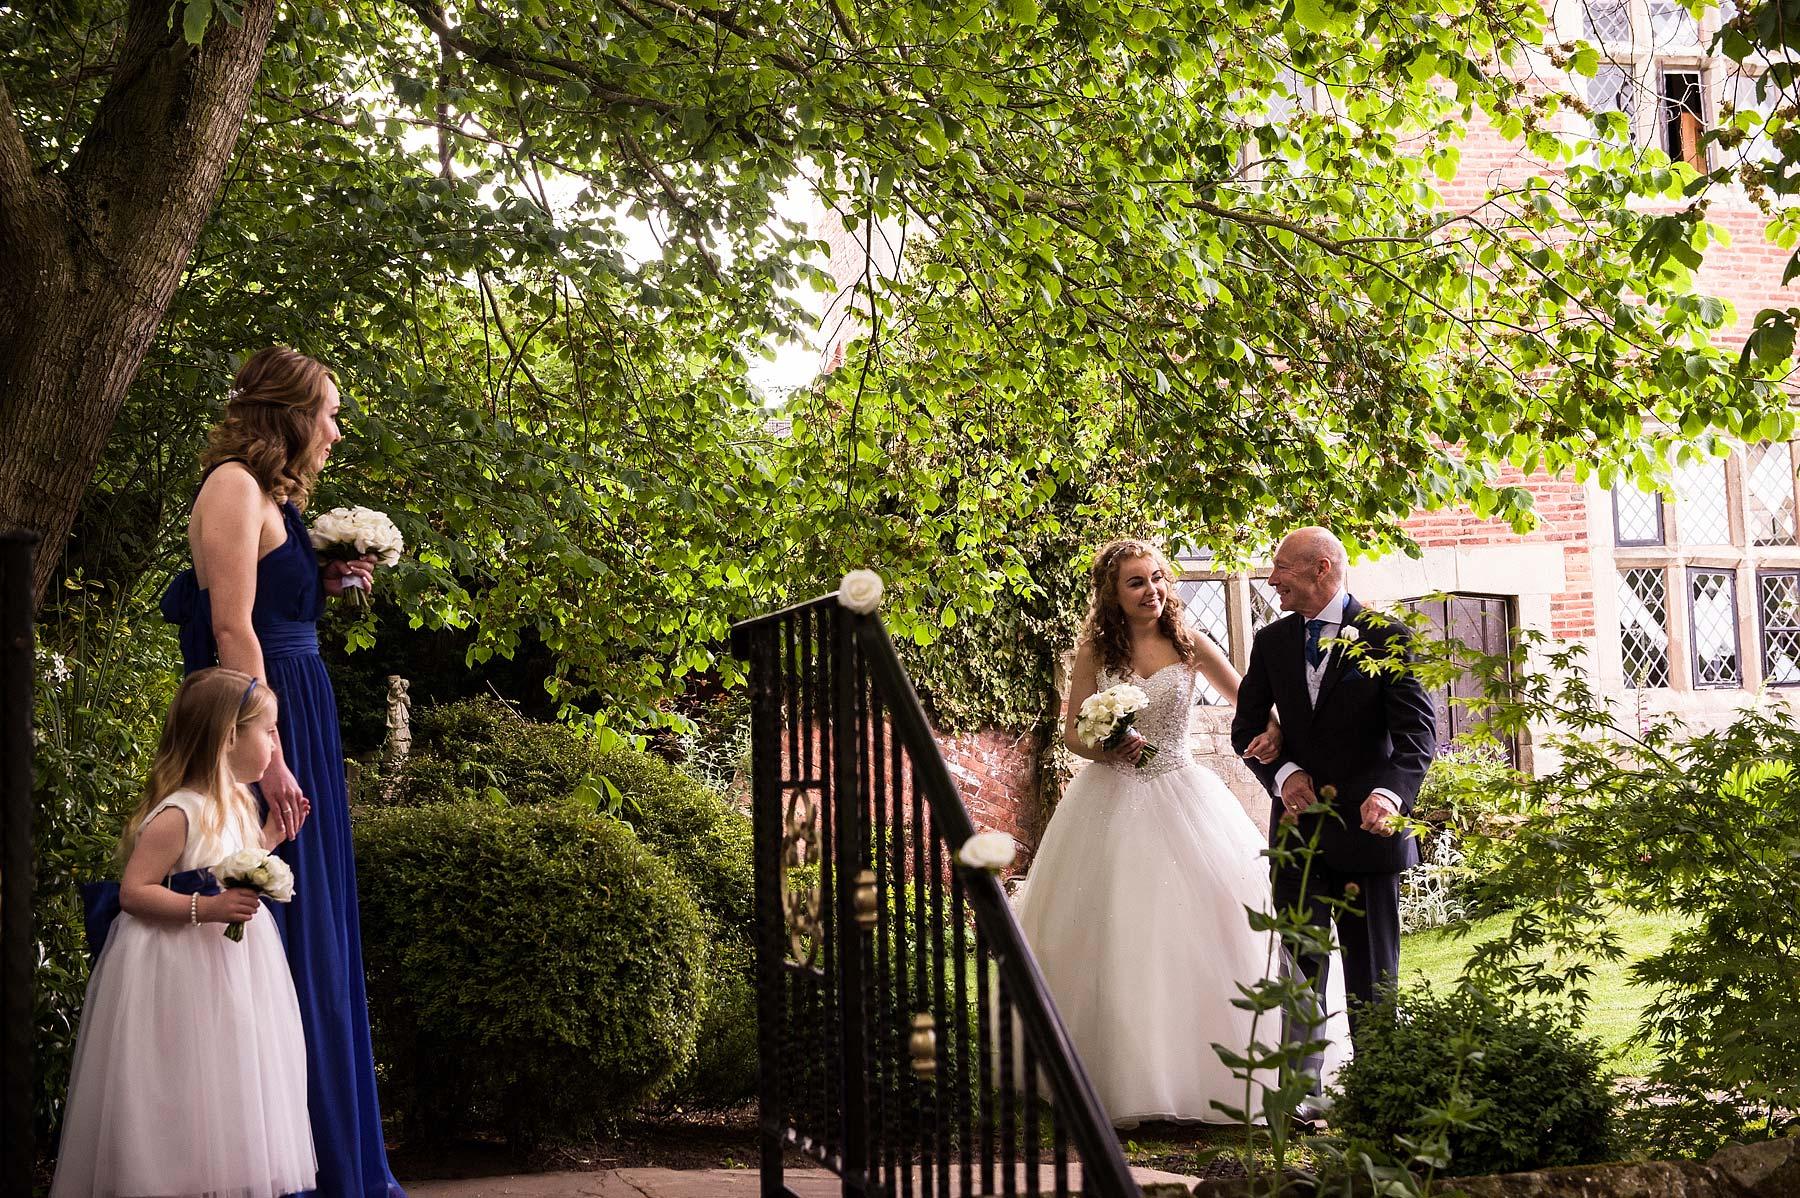 albright-hussey-manor-wedding-photographers-023